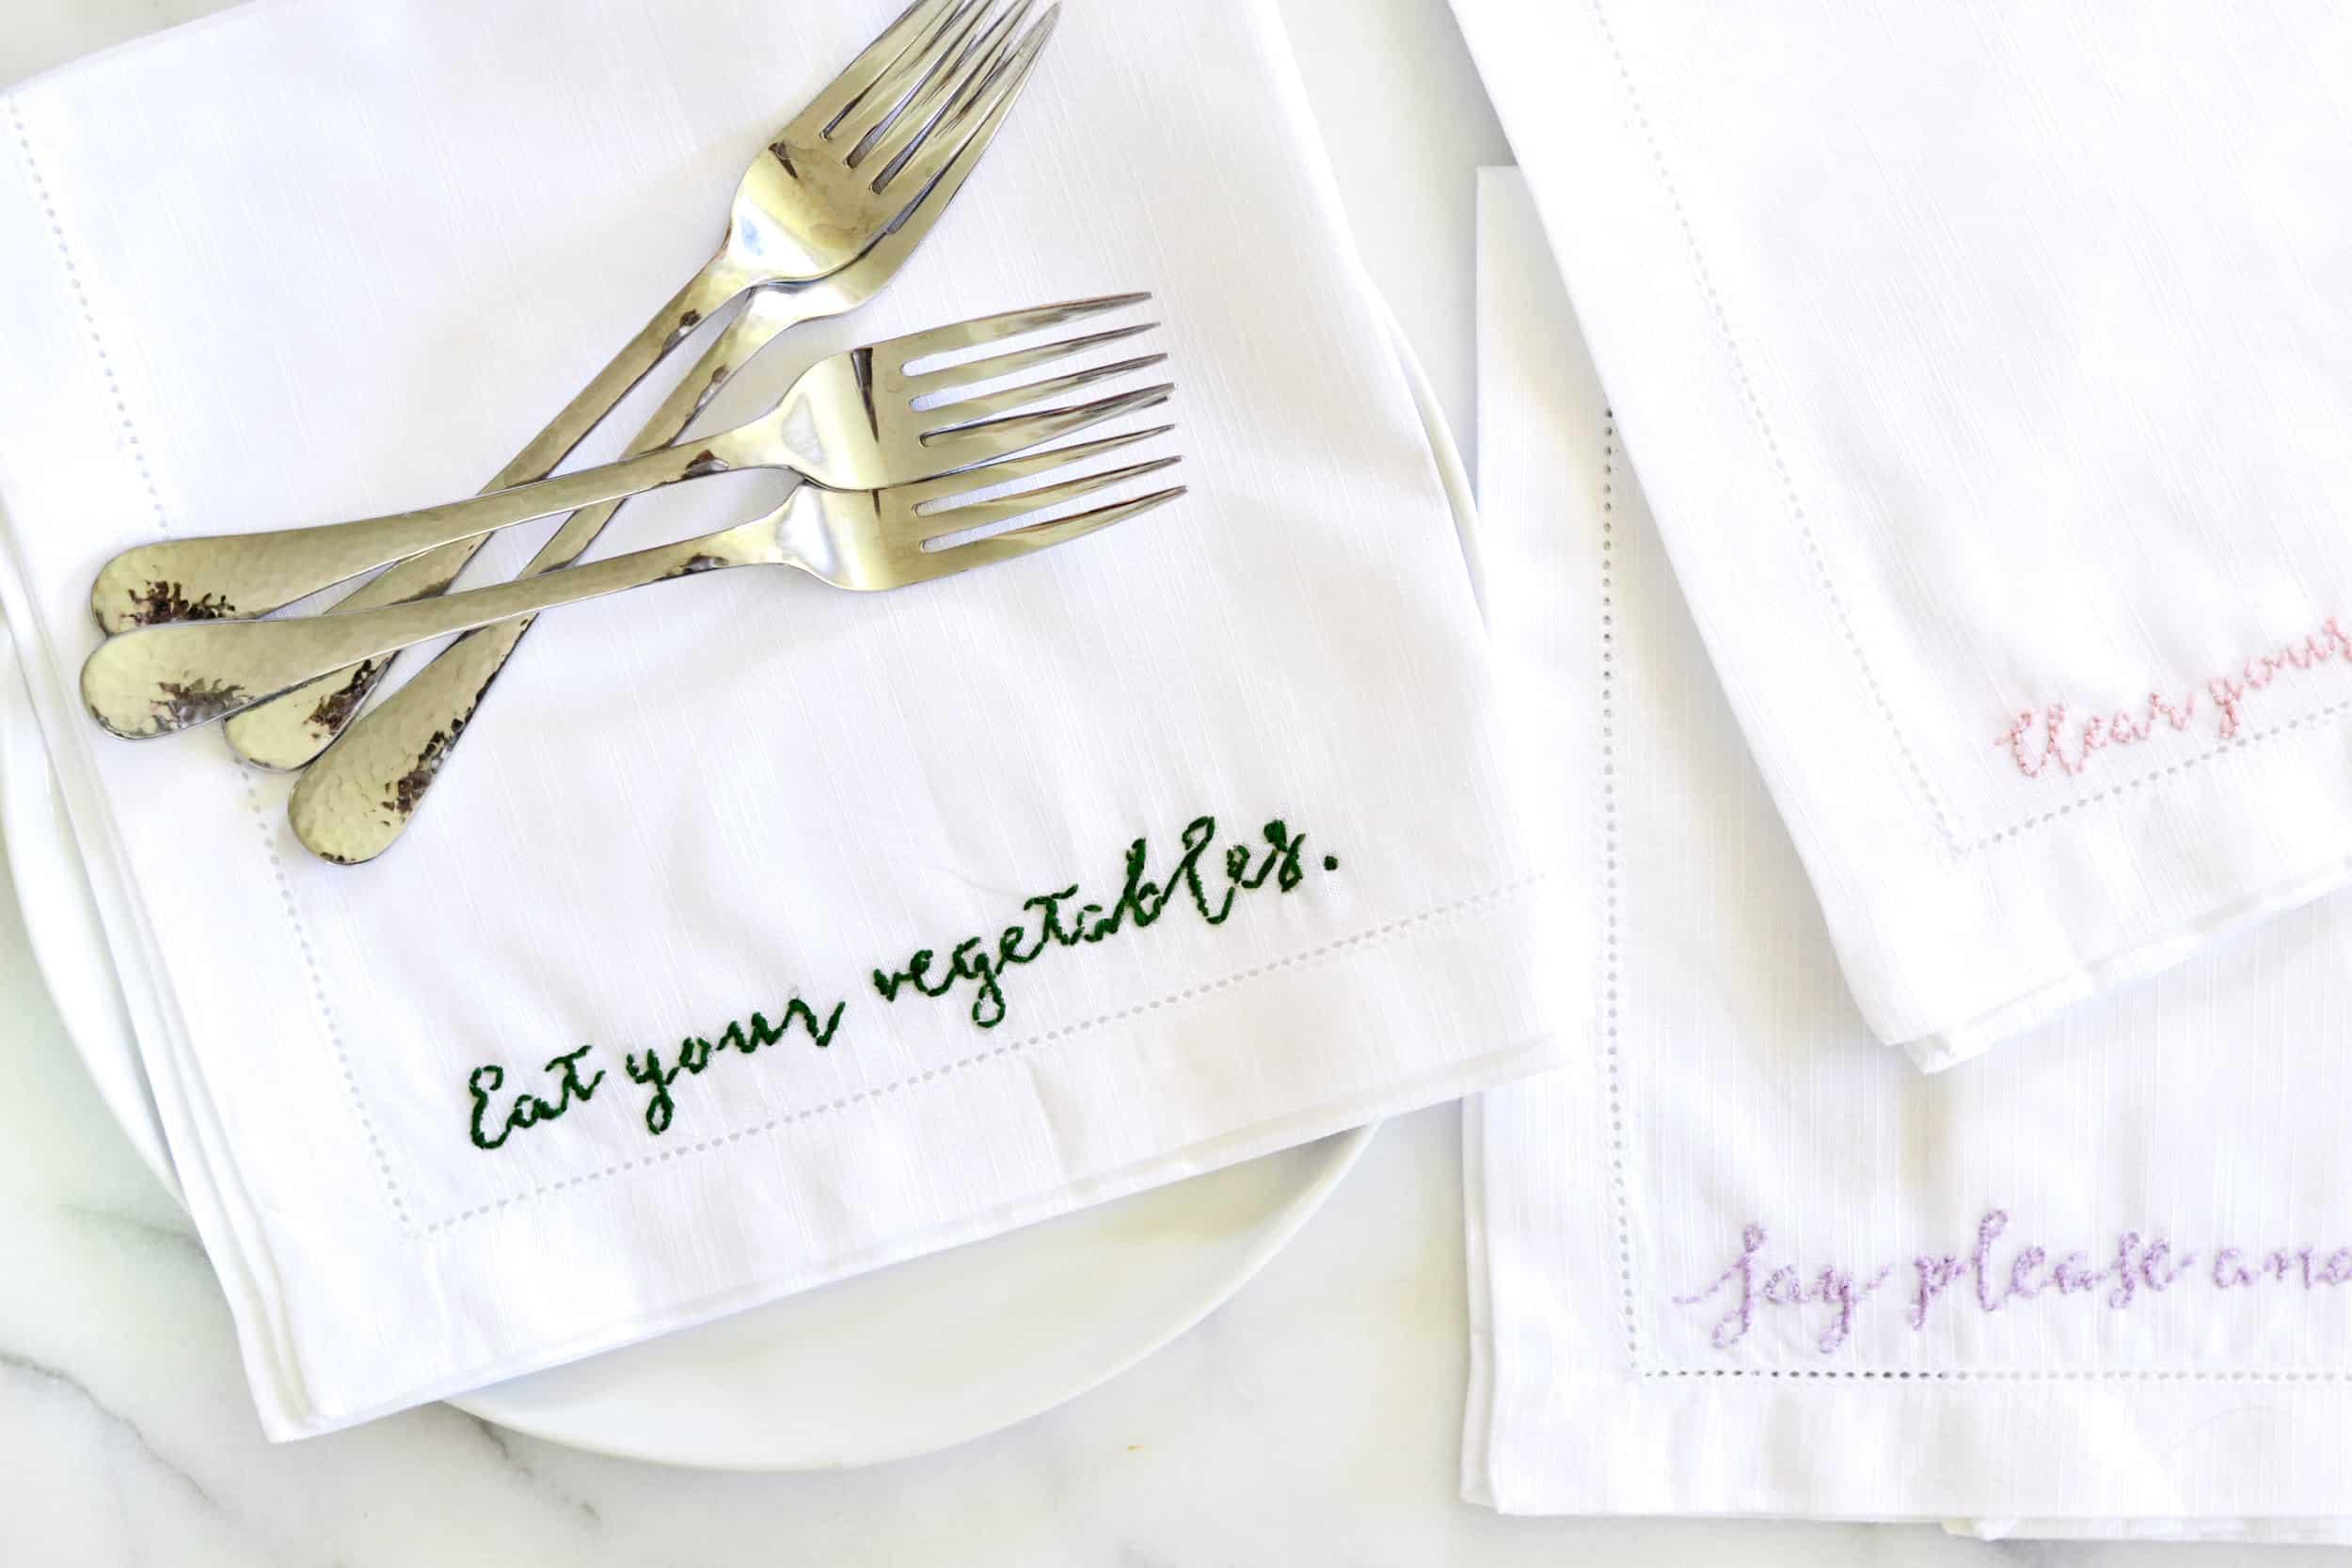 embroidered napkins